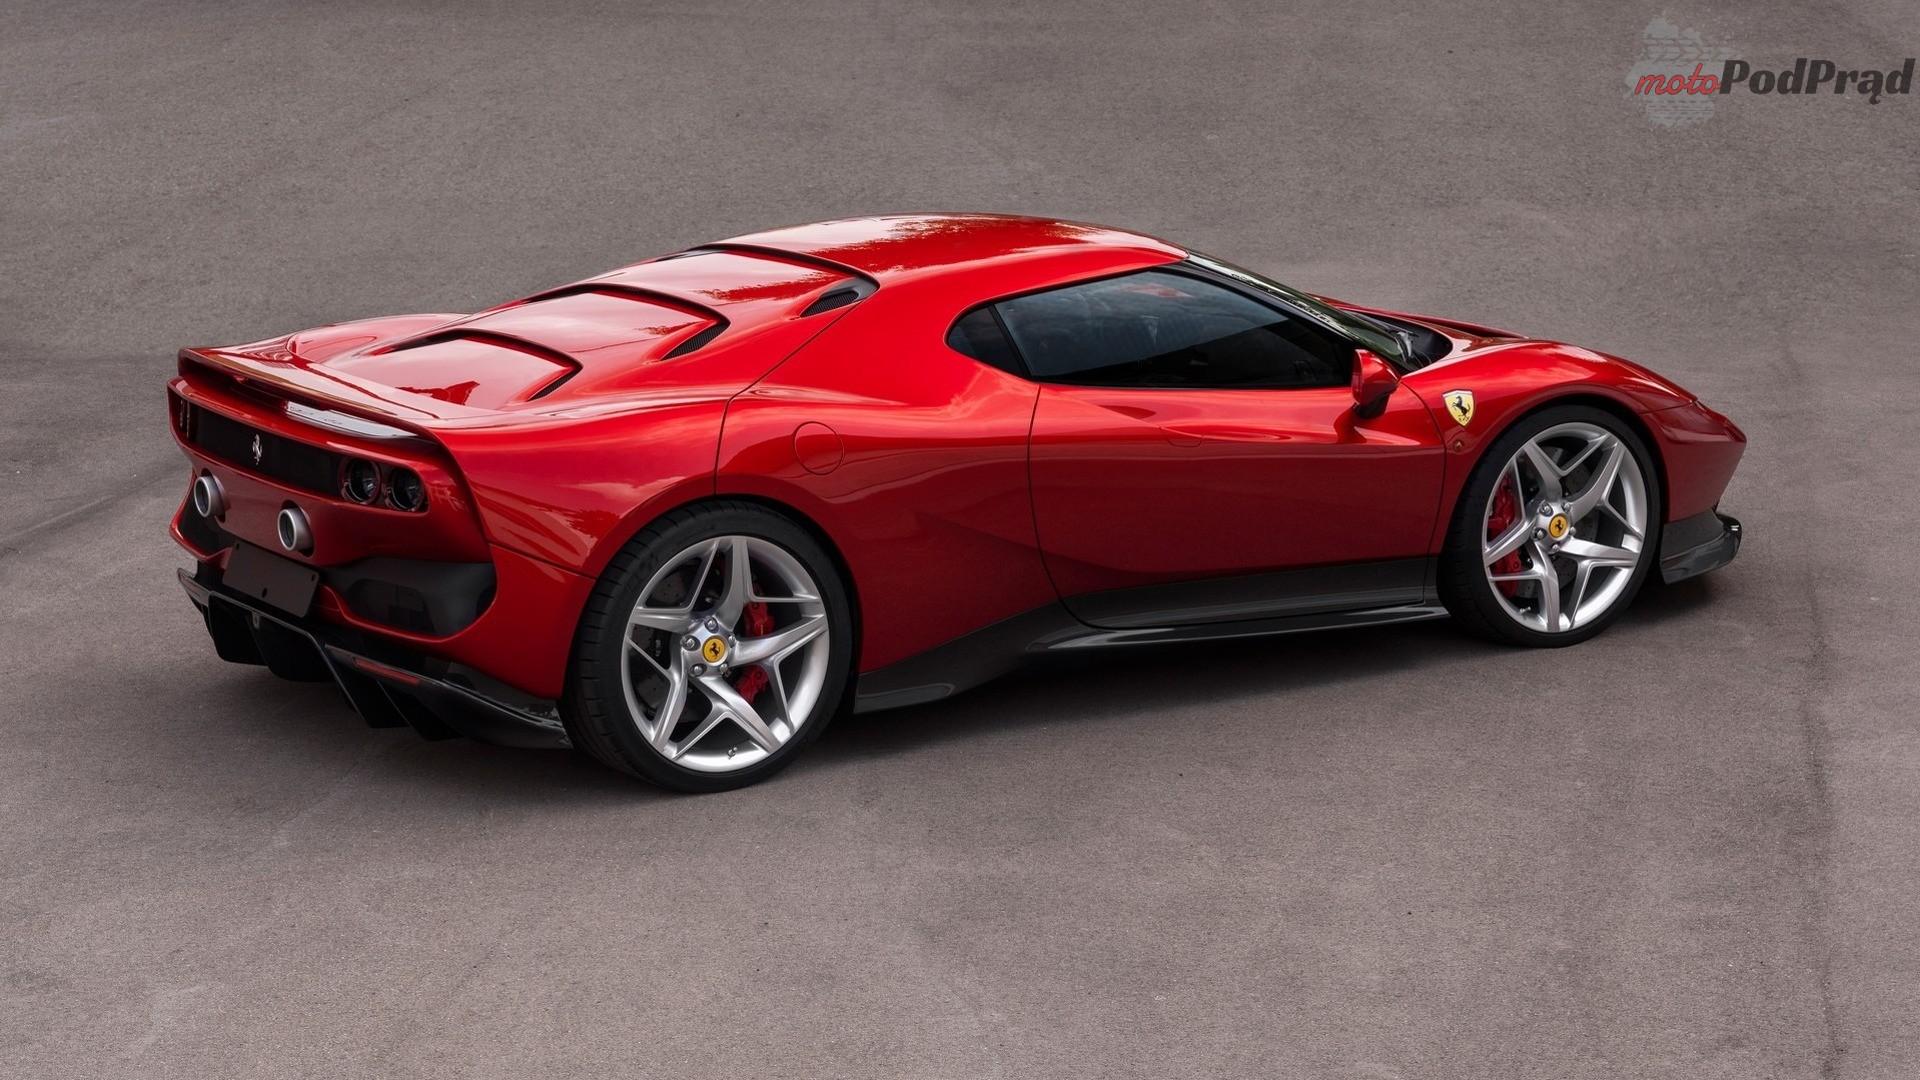 ferrari sp38 2 Ferrari SP38 w hołdzie F40